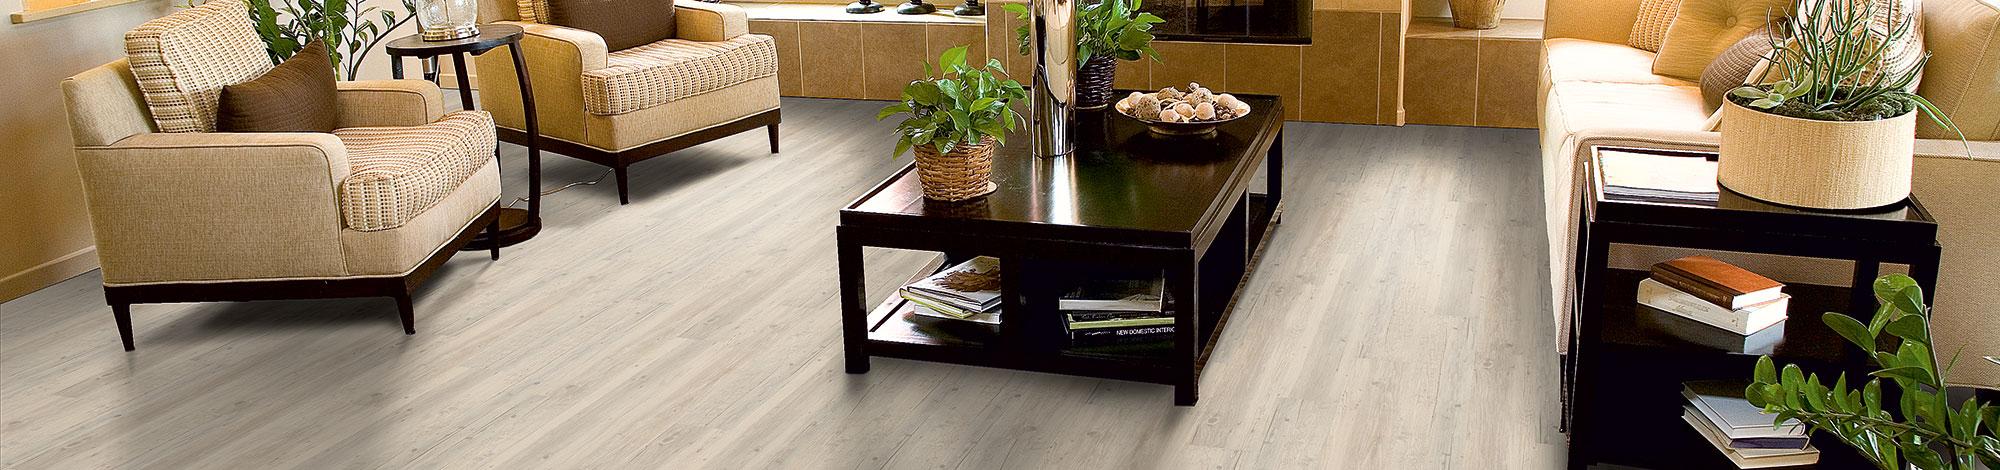 d sselvinyl ihr designbelag f r d sseldorf bodenbelag koch gmbh co kg parkett laminat. Black Bedroom Furniture Sets. Home Design Ideas